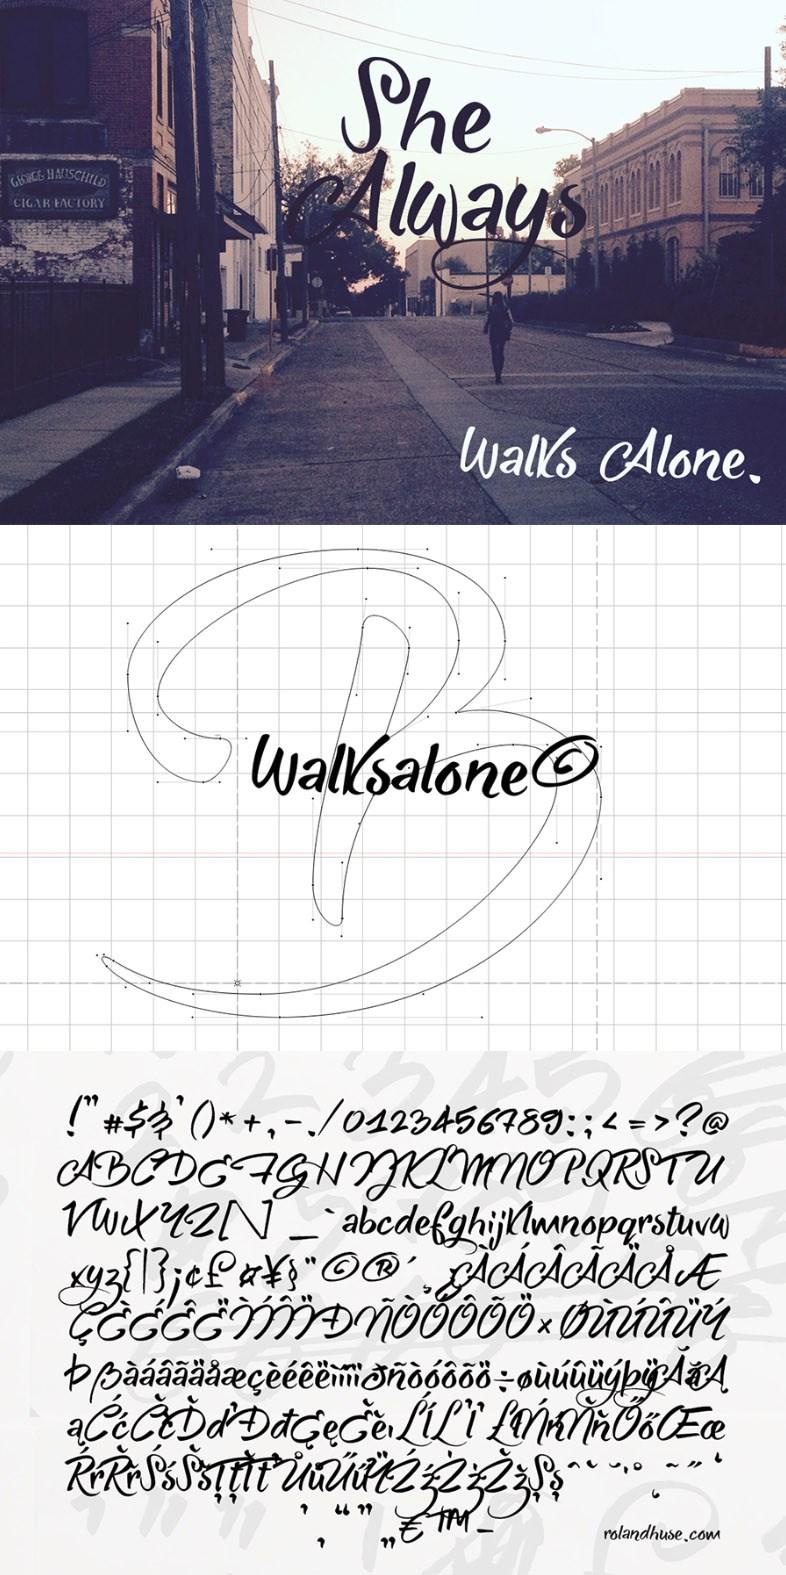 https://fontclarity.com/wp-content/uploads/2019/09/she-always-walks-alone-download-0.jpg Free Download